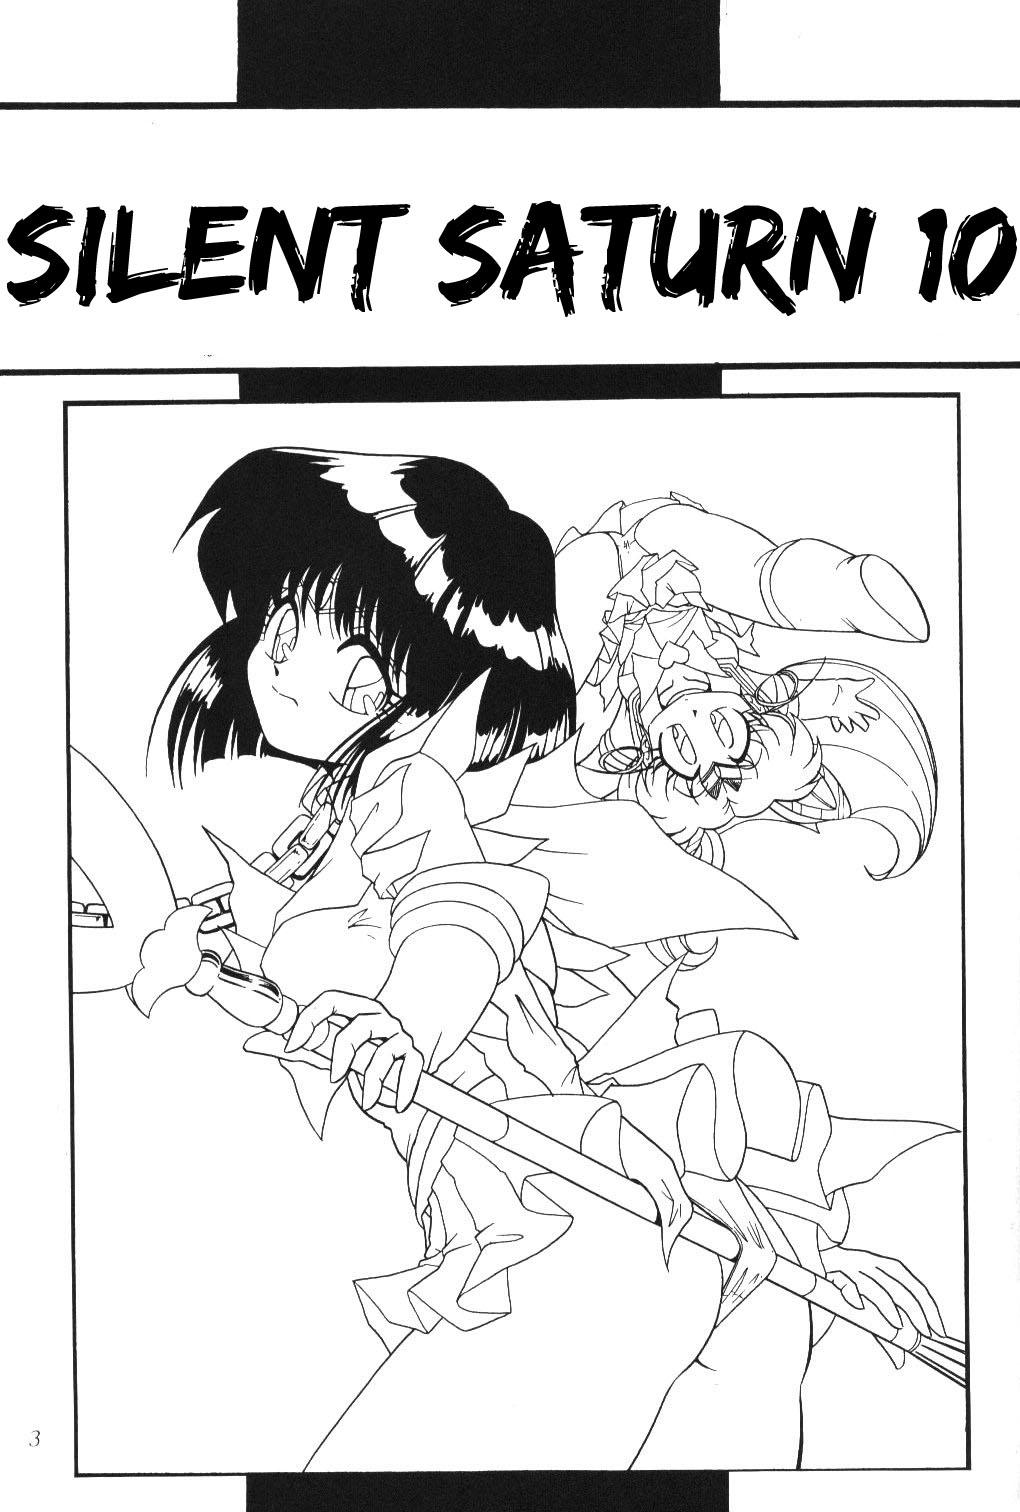 Silent Saturn 10 1